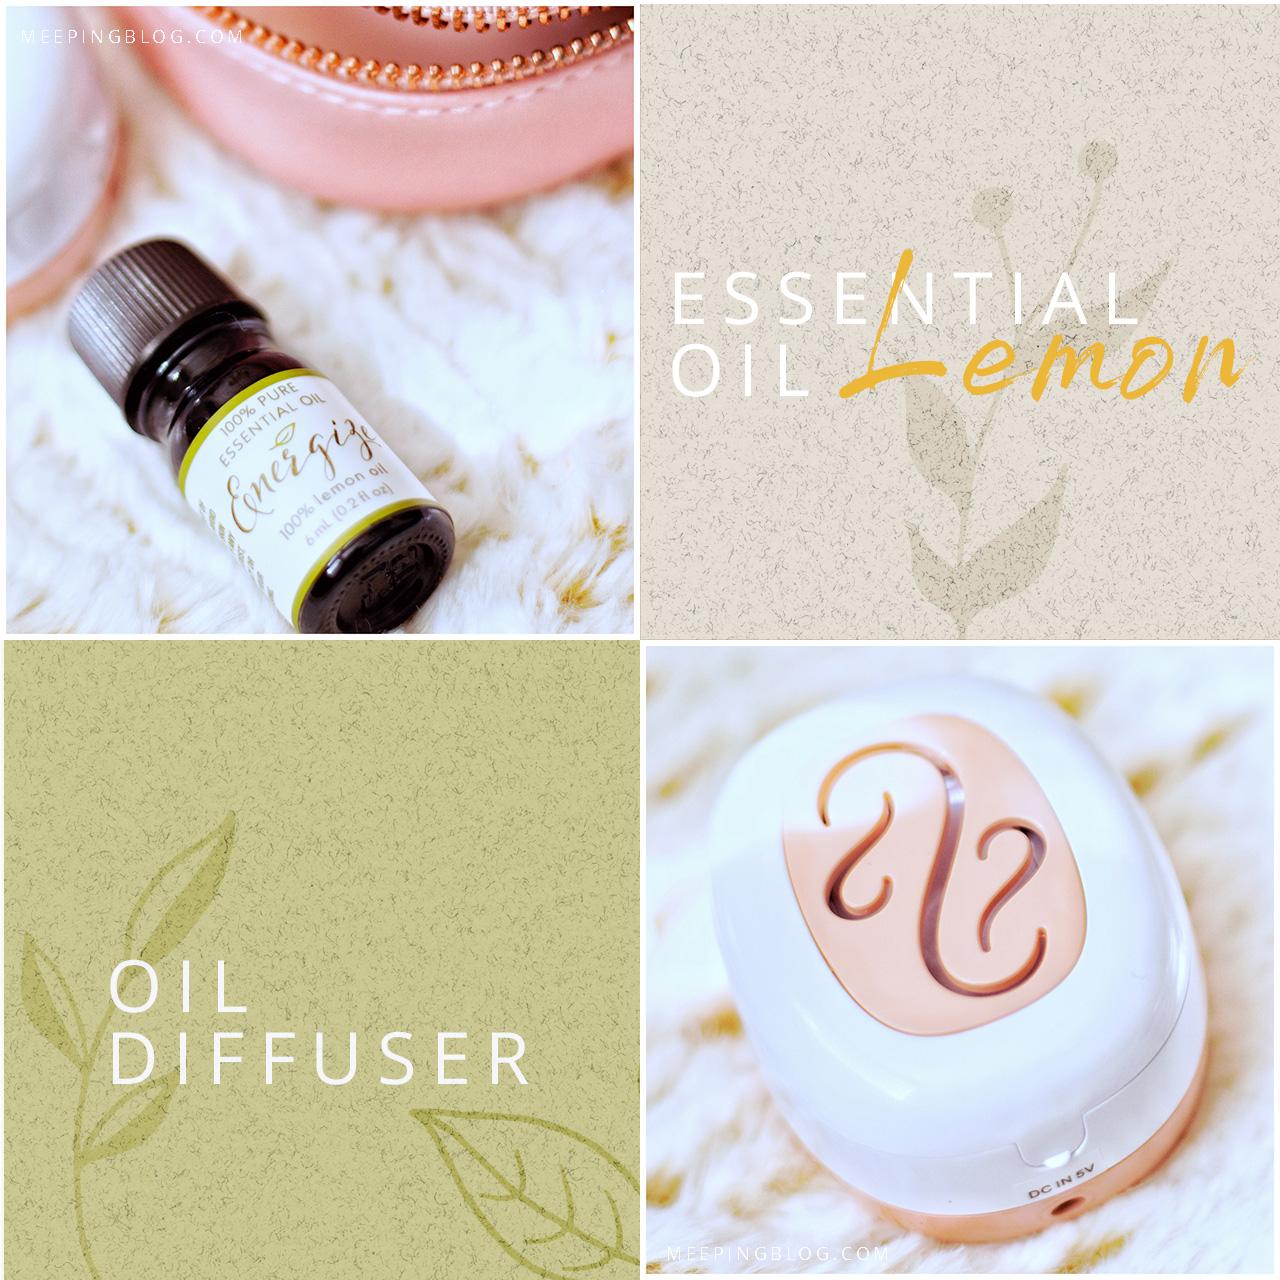 Laura Ashley Portable Essential Oil Diffuser Details